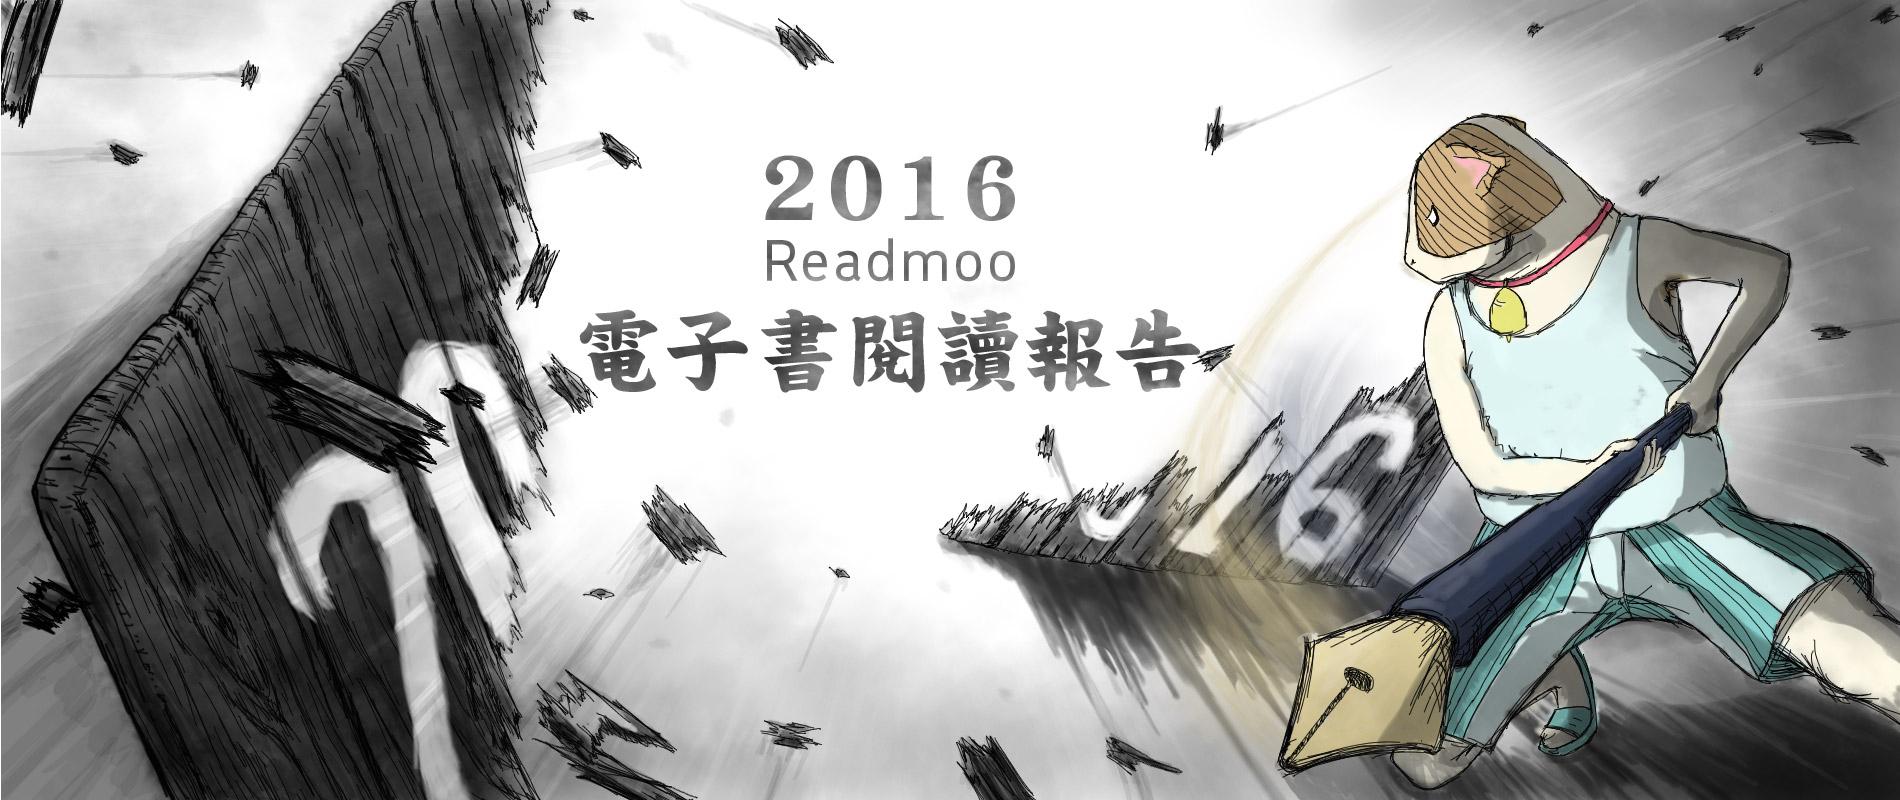 2016 Readmoo電子書閱讀報告